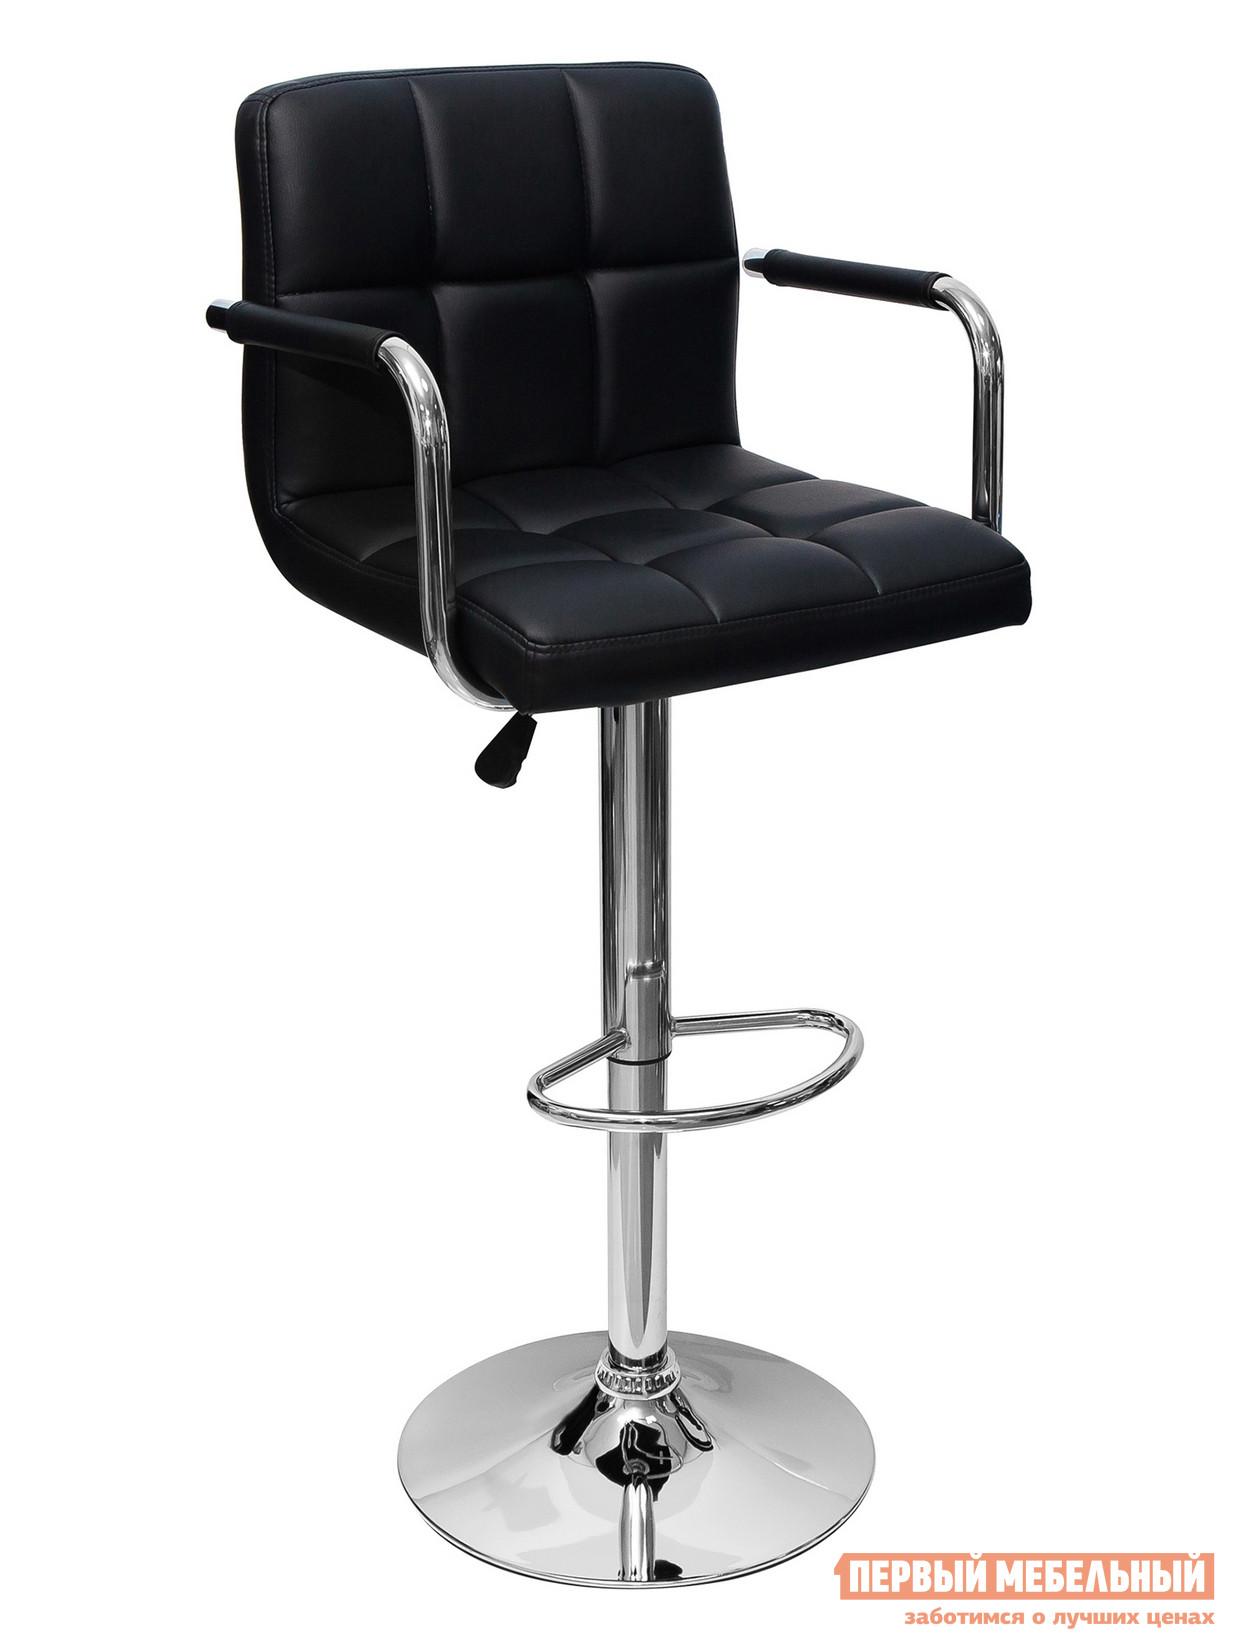 Барный стул STOOL GROUP Малави Черный